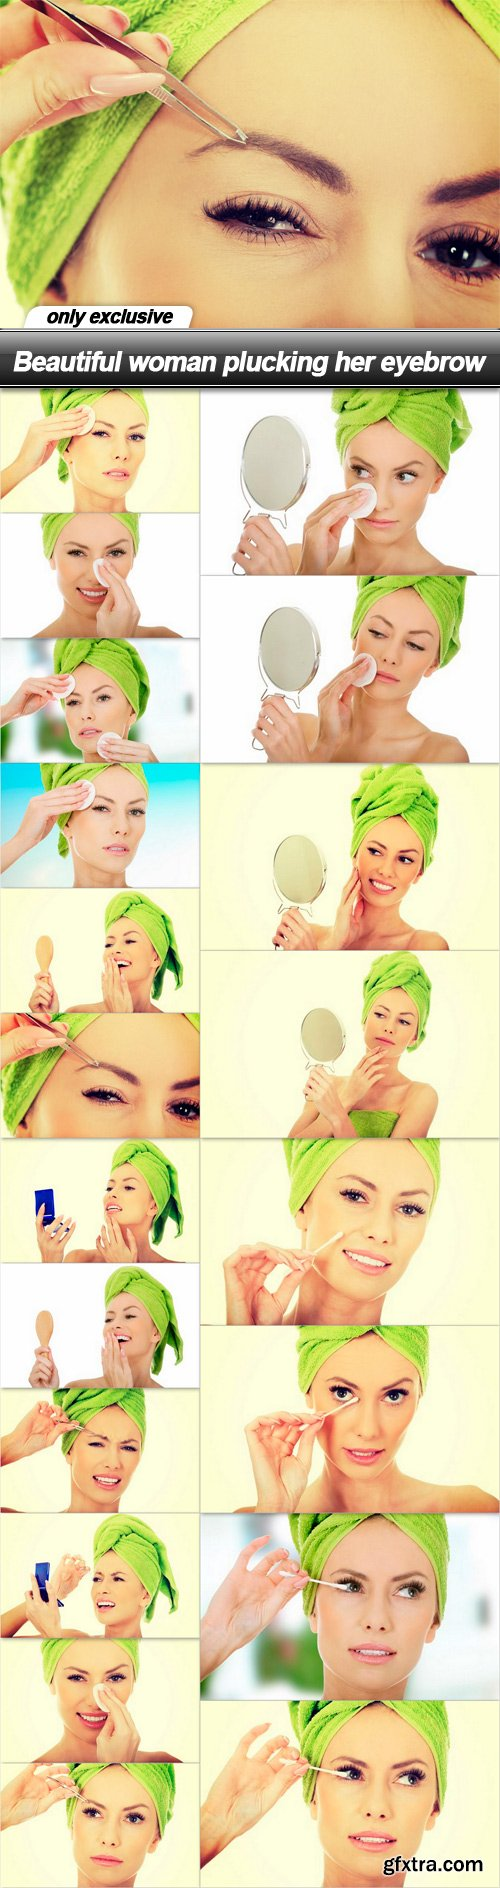 Beautiful woman plucking her eyebrow - 20 UHQ JPEG